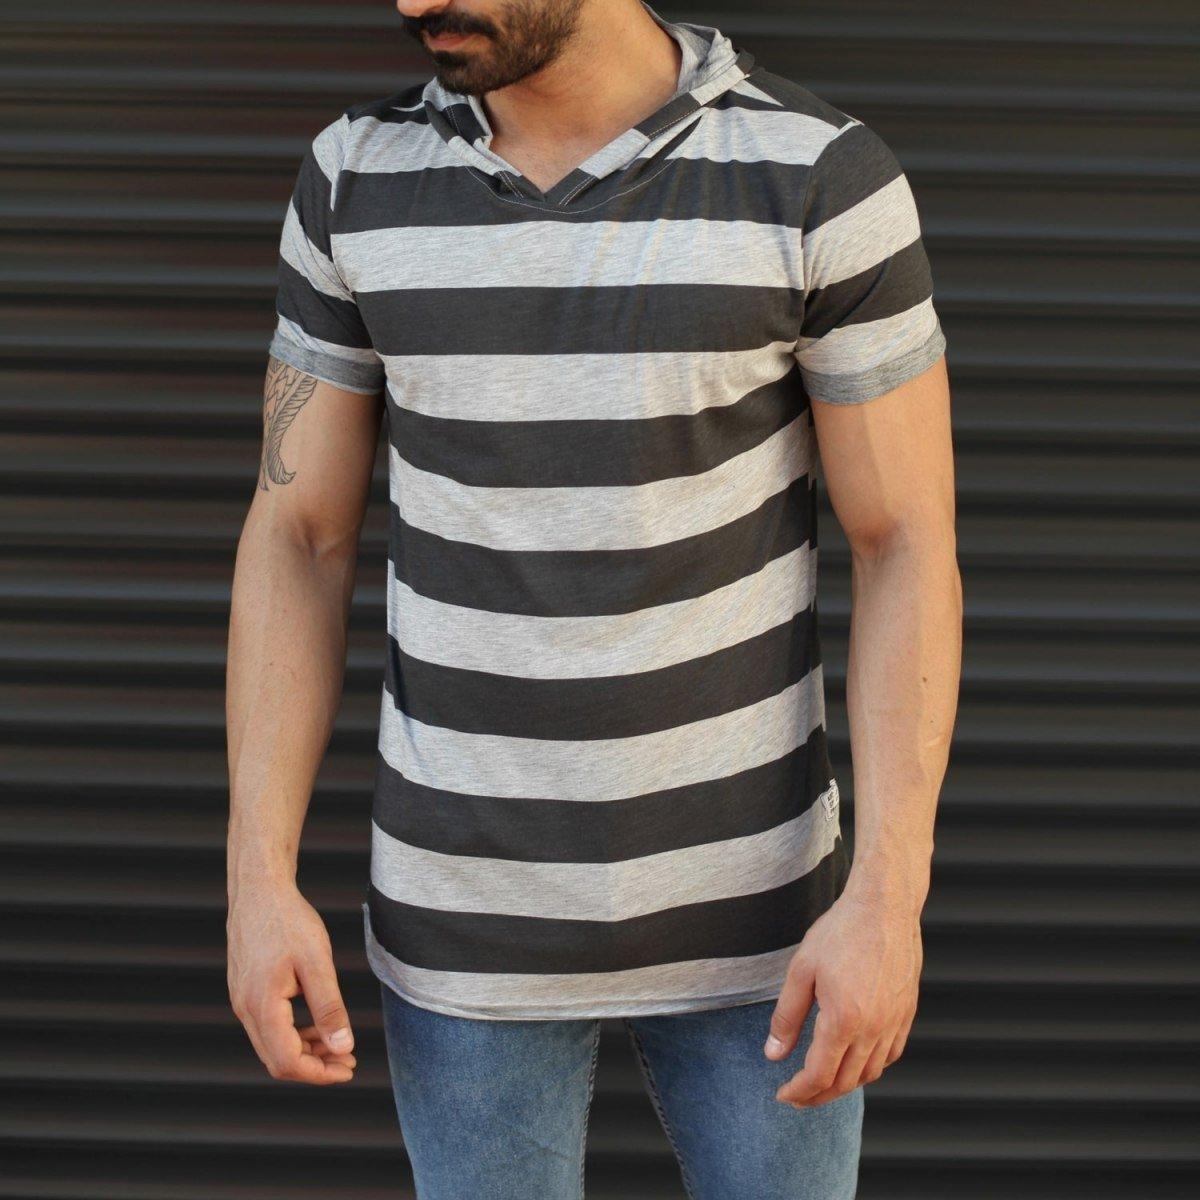 Men's Hooded Longline Thick Striped T-Shirt Gray Mv Premium Brand - 2